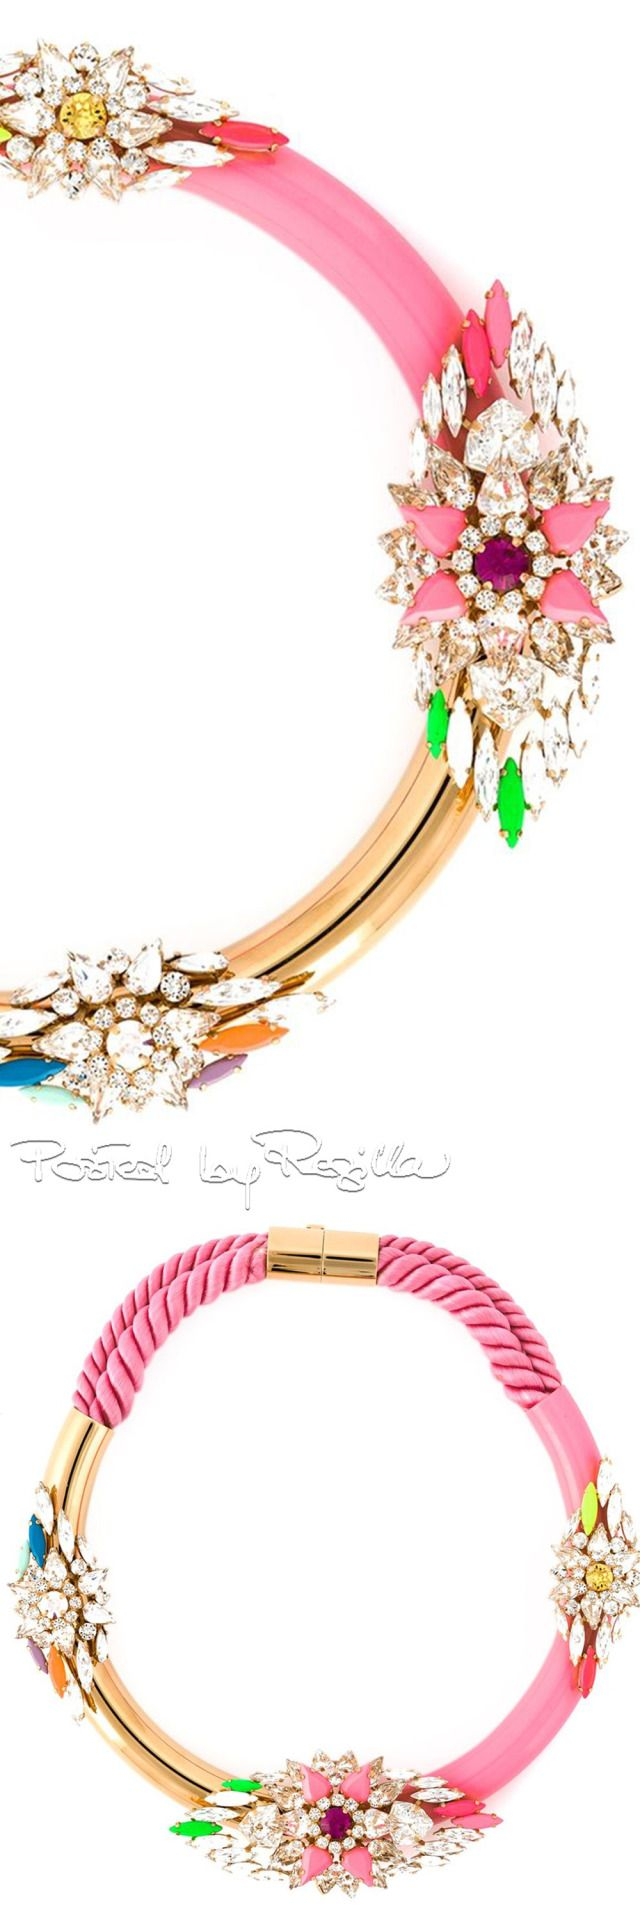 Best images about Dazzling Neck on Pinterest  Swarovski crystals